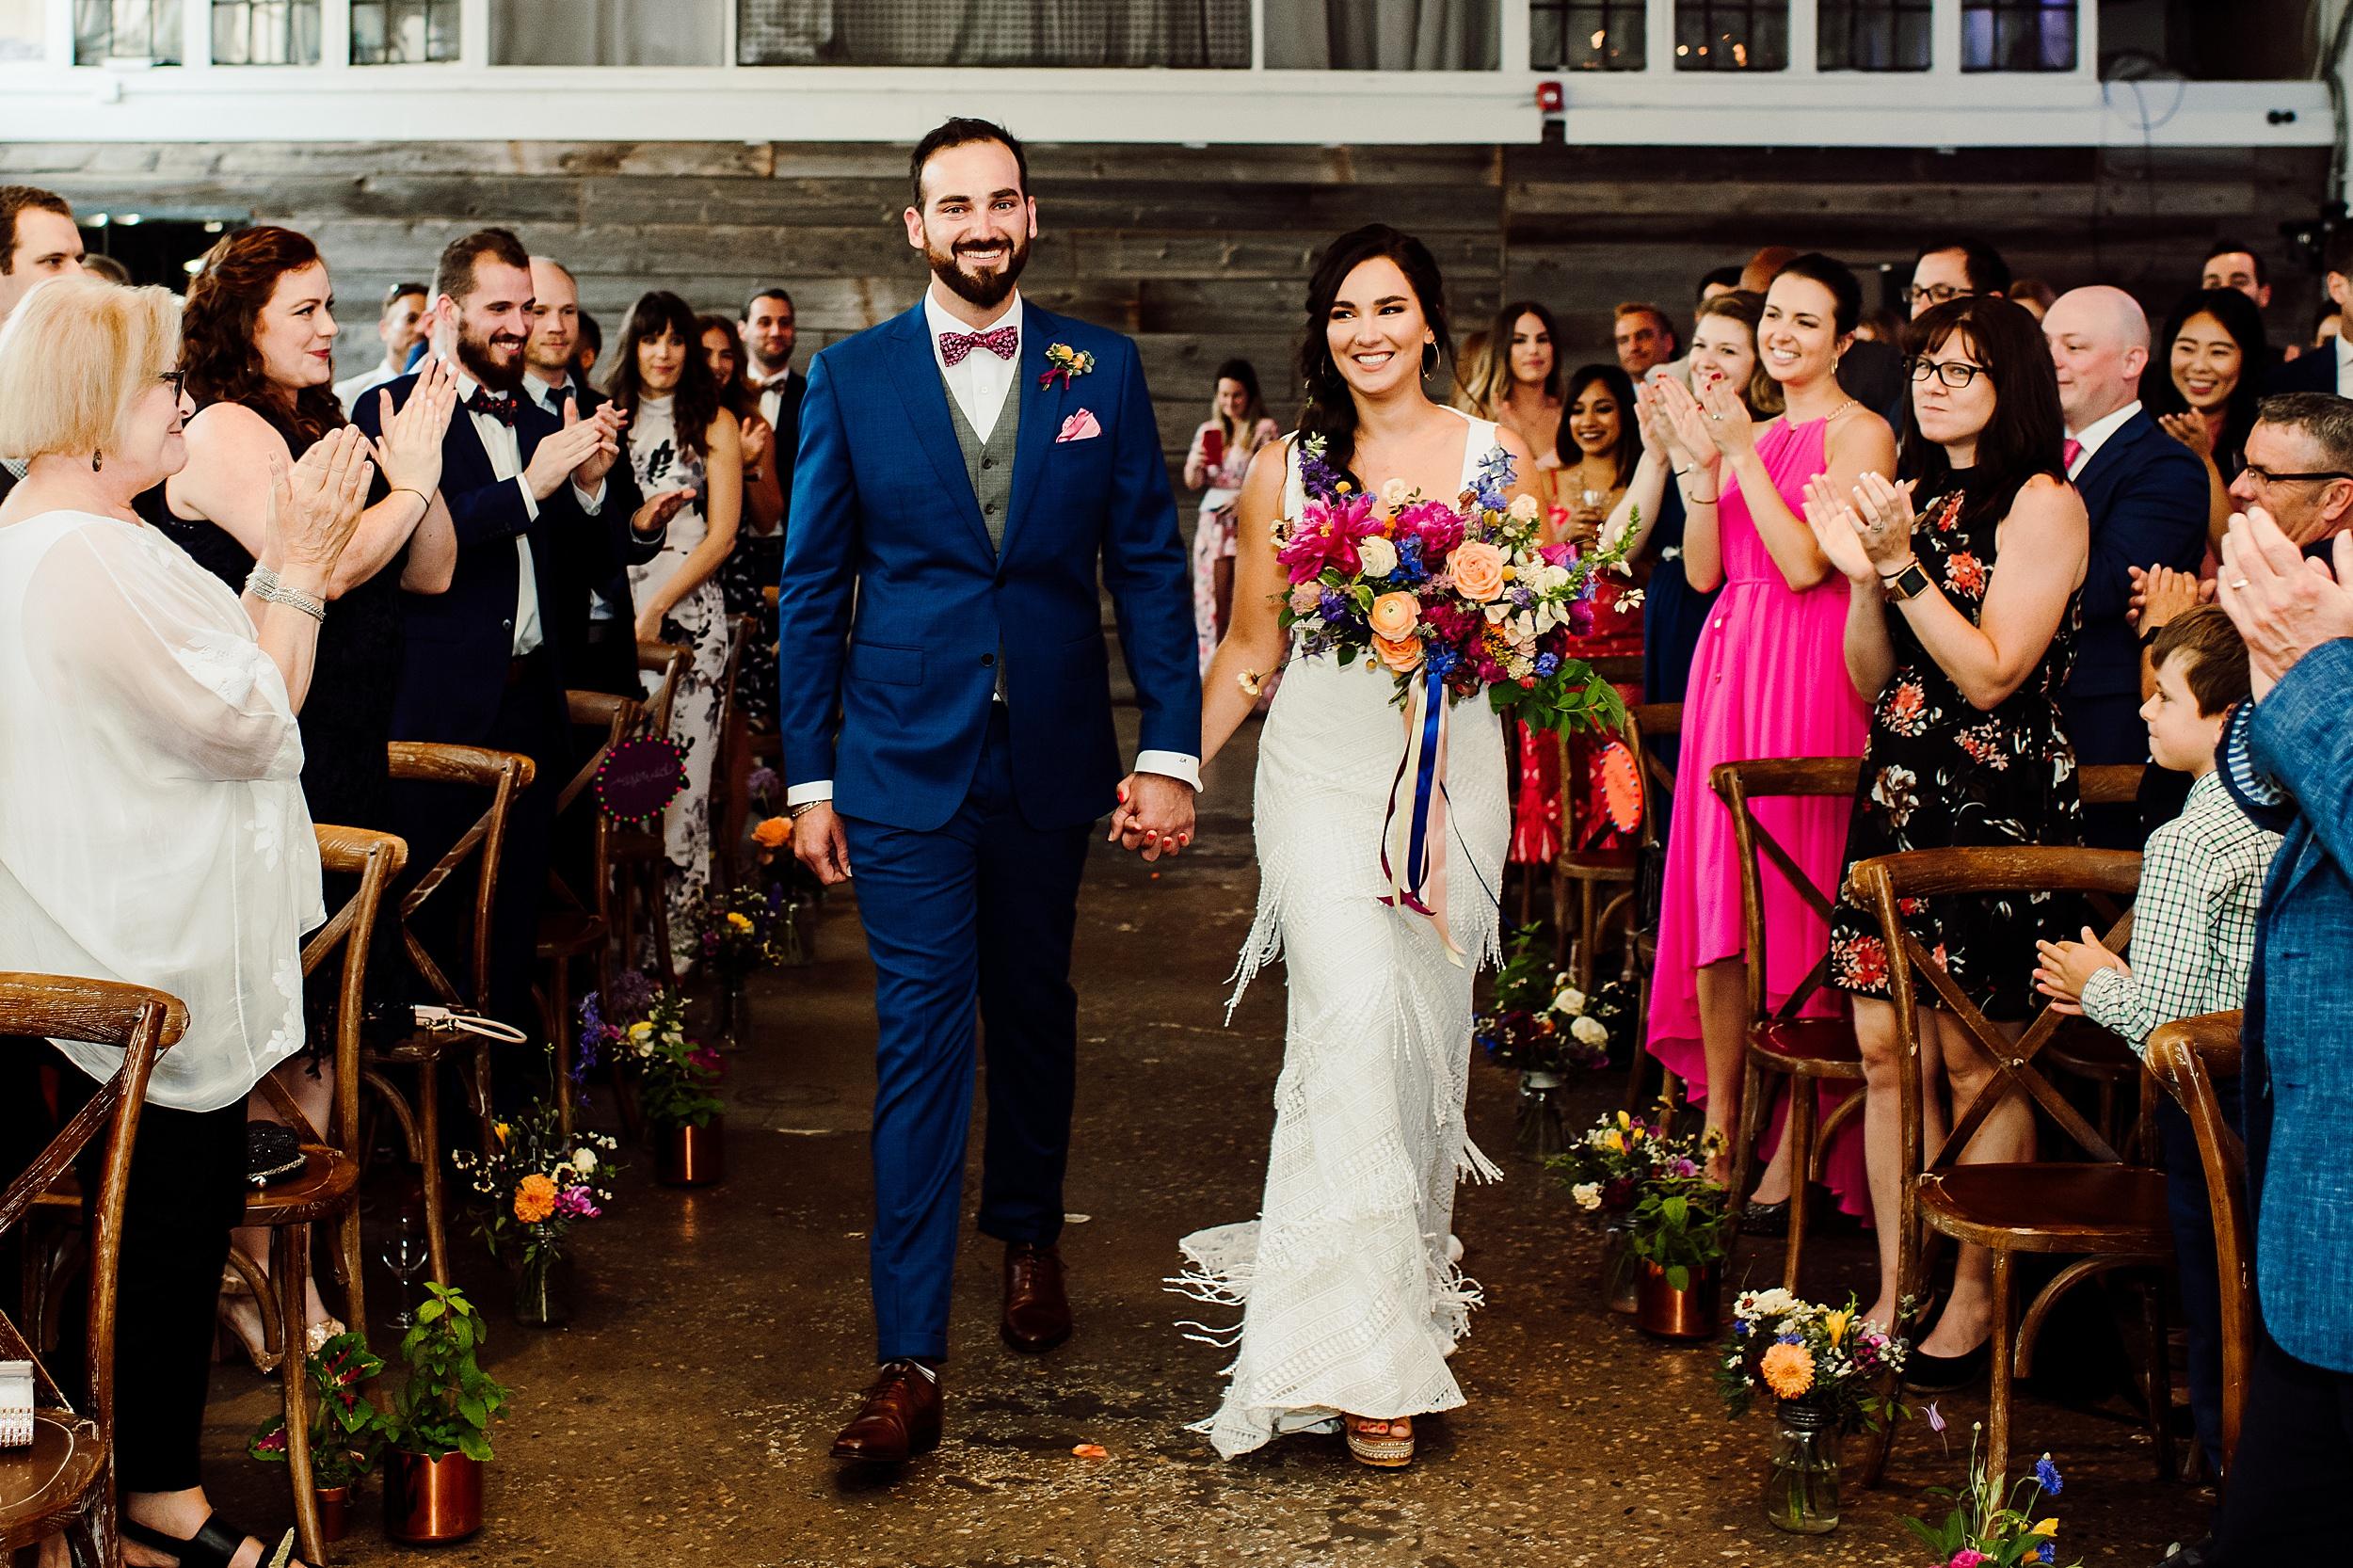 Airship-37-Berkeley-Events-Distillery-District-Wedding-Toronto-Wedding-Photographers_0061.jpg